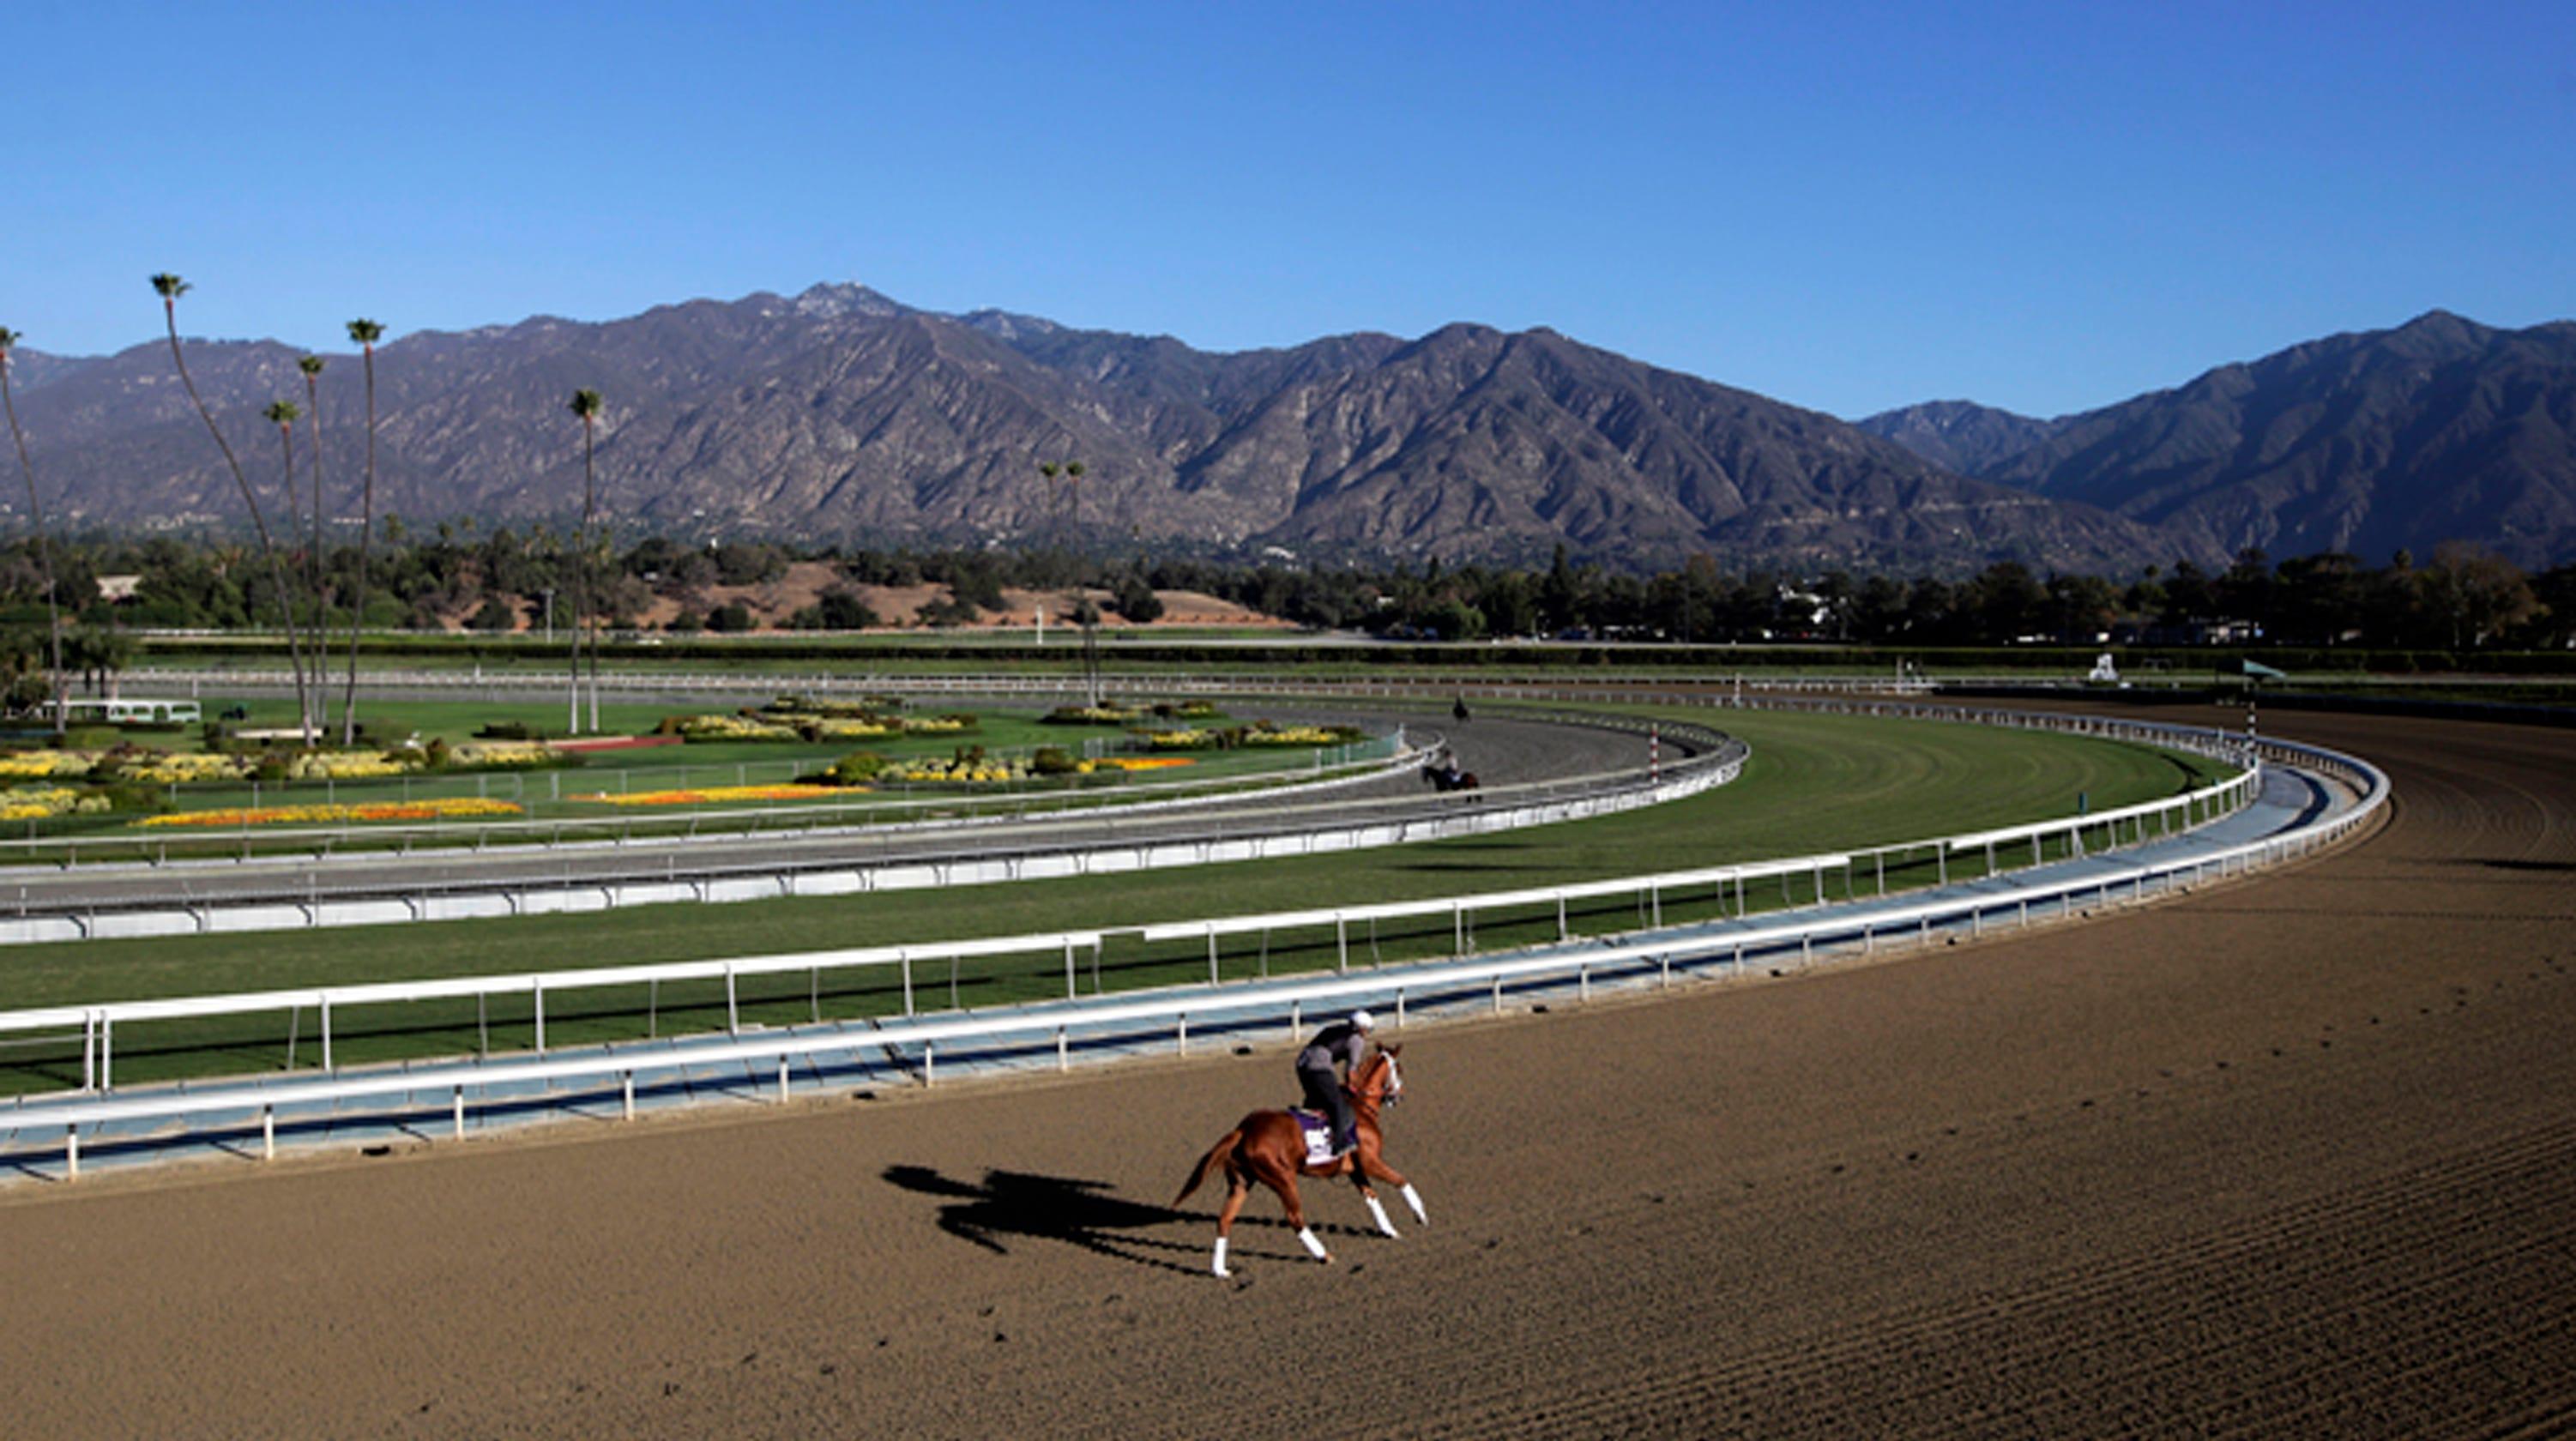 Santa Anita Park sees 26th horse death since late December